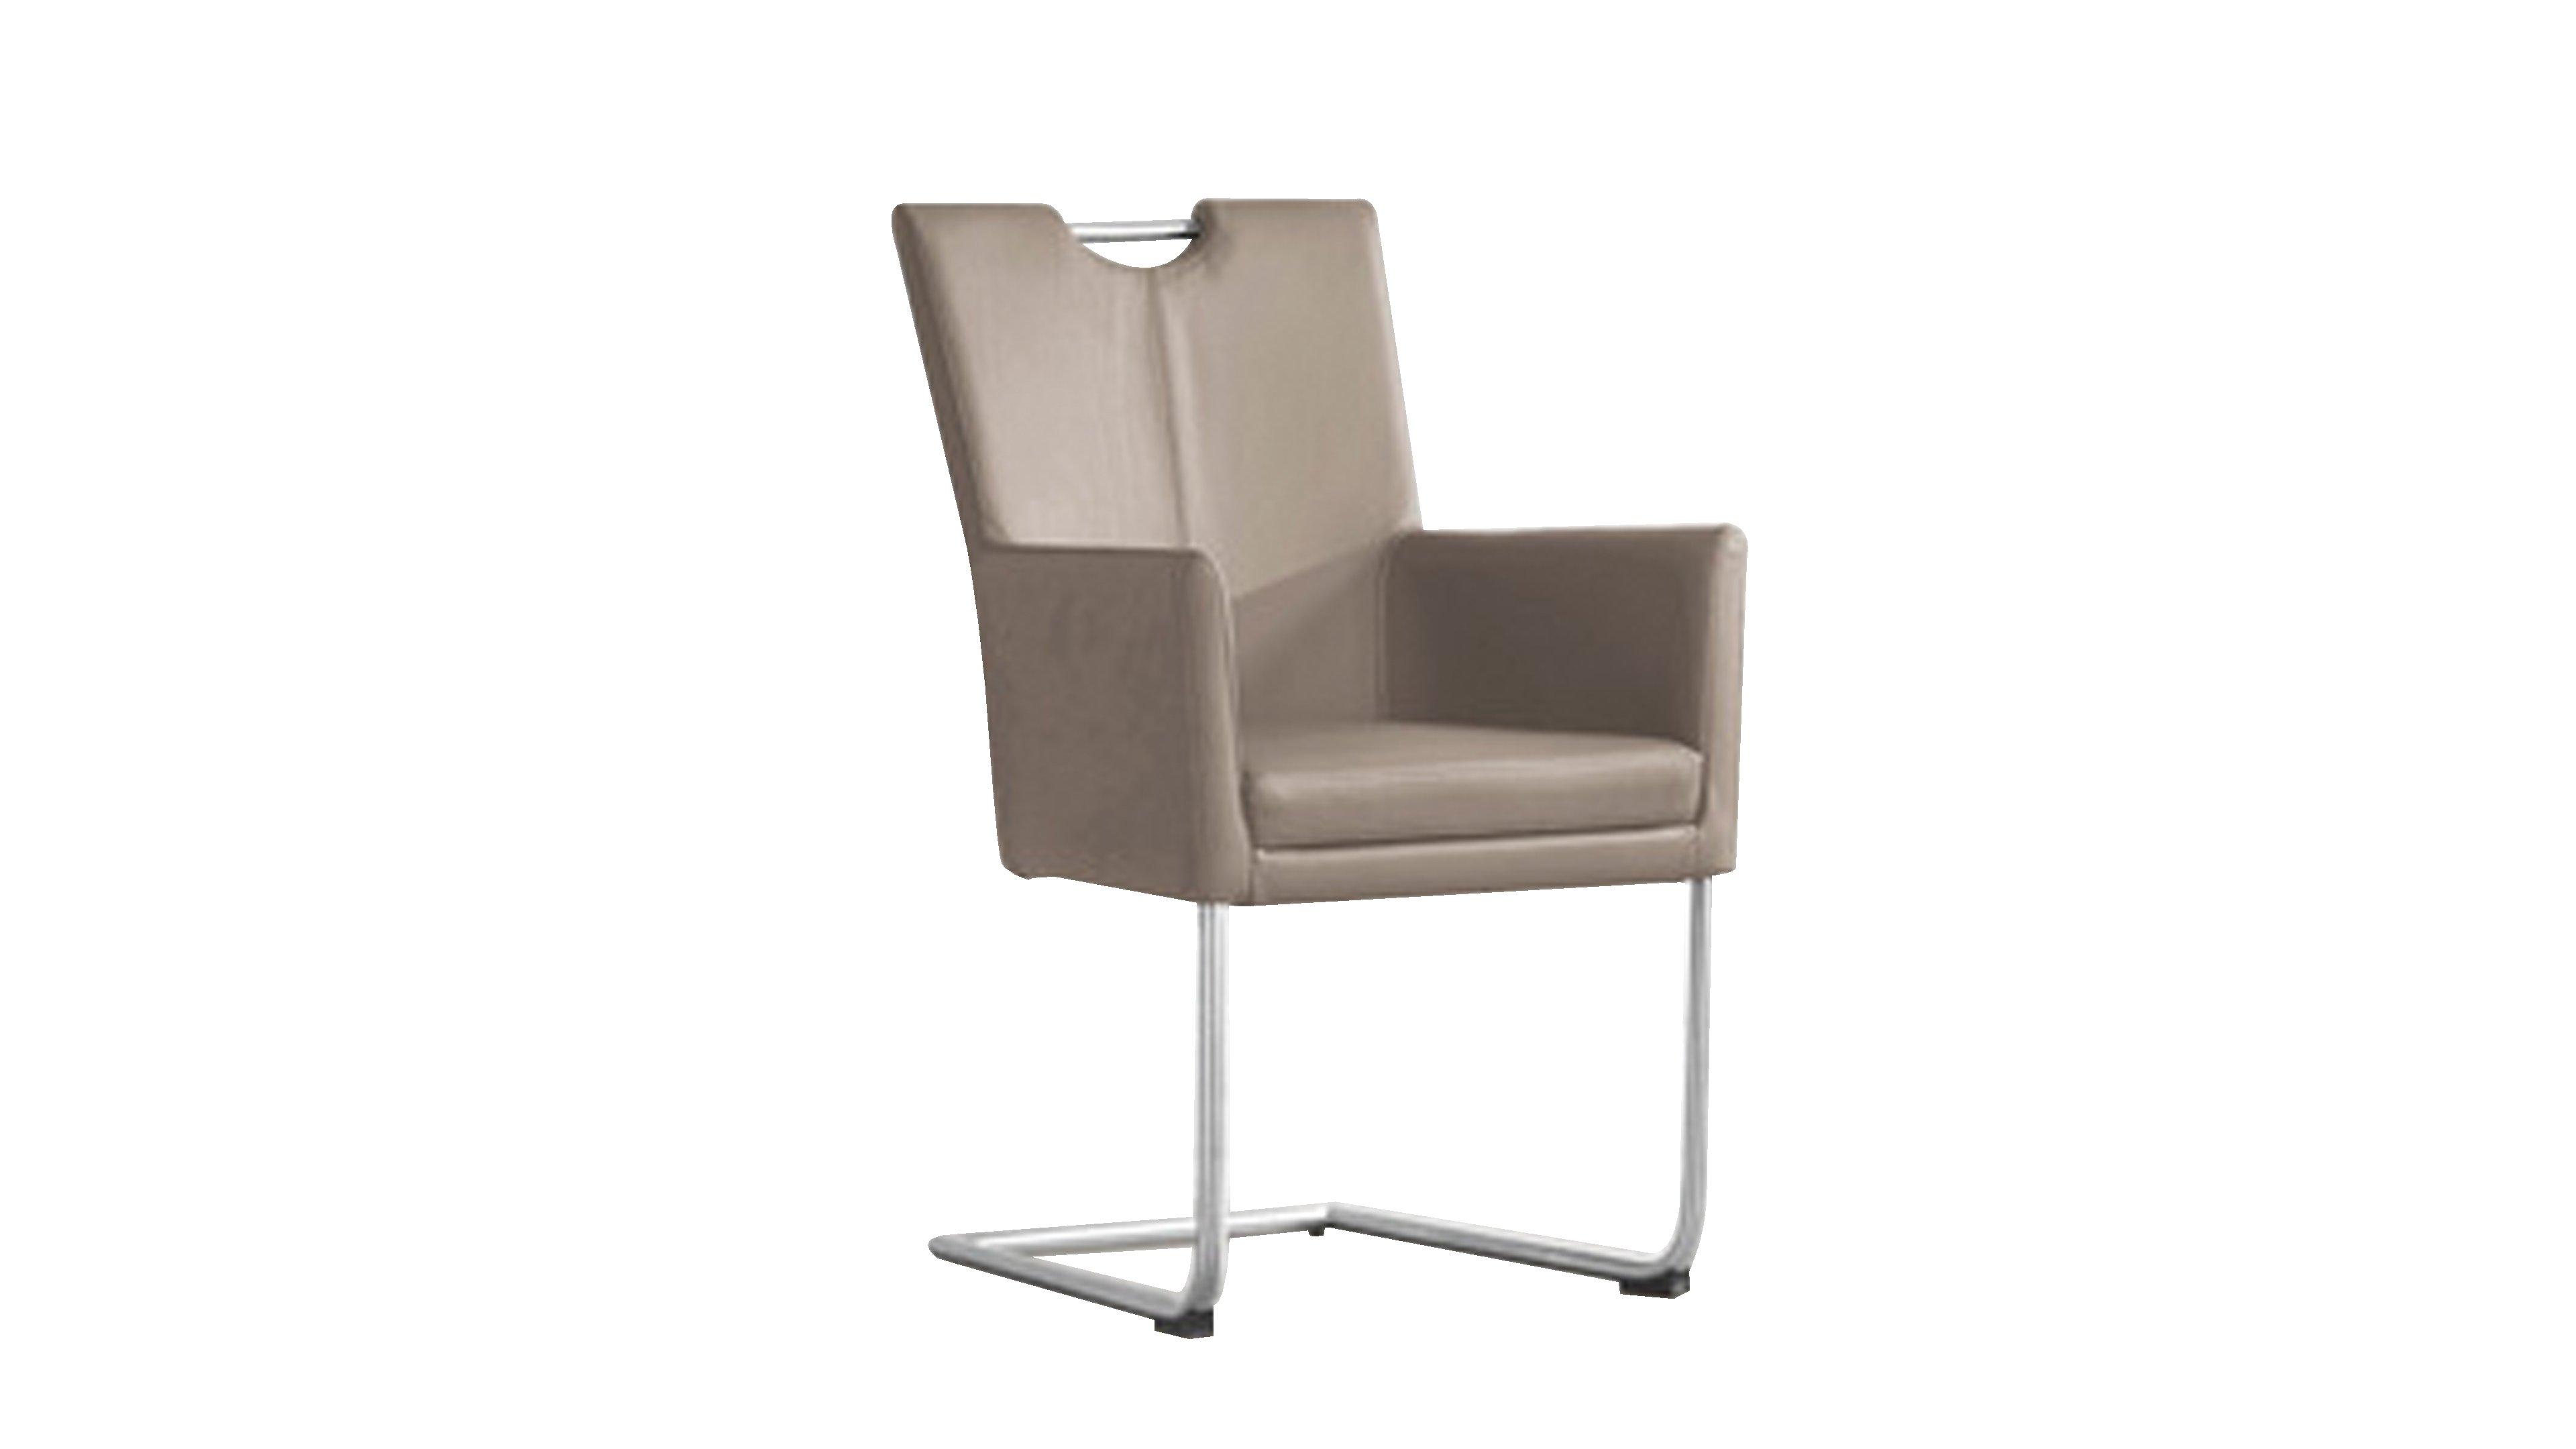 Schwingstuhl LaVie (Color Line) 0742=4-Fuss-Stuhl Holz